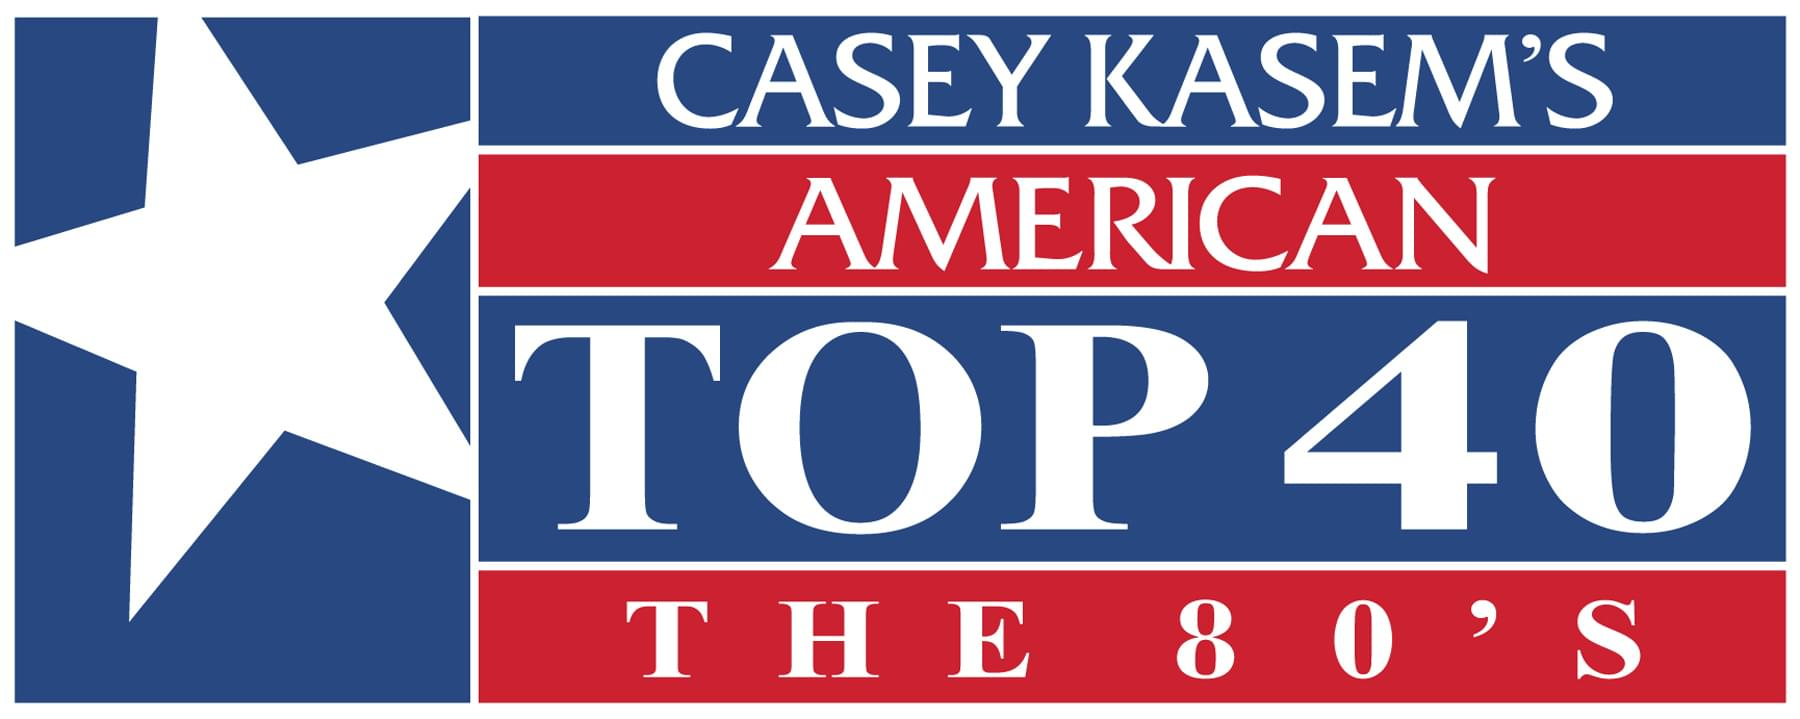 Casey Kasem's American Top 40: The 80's